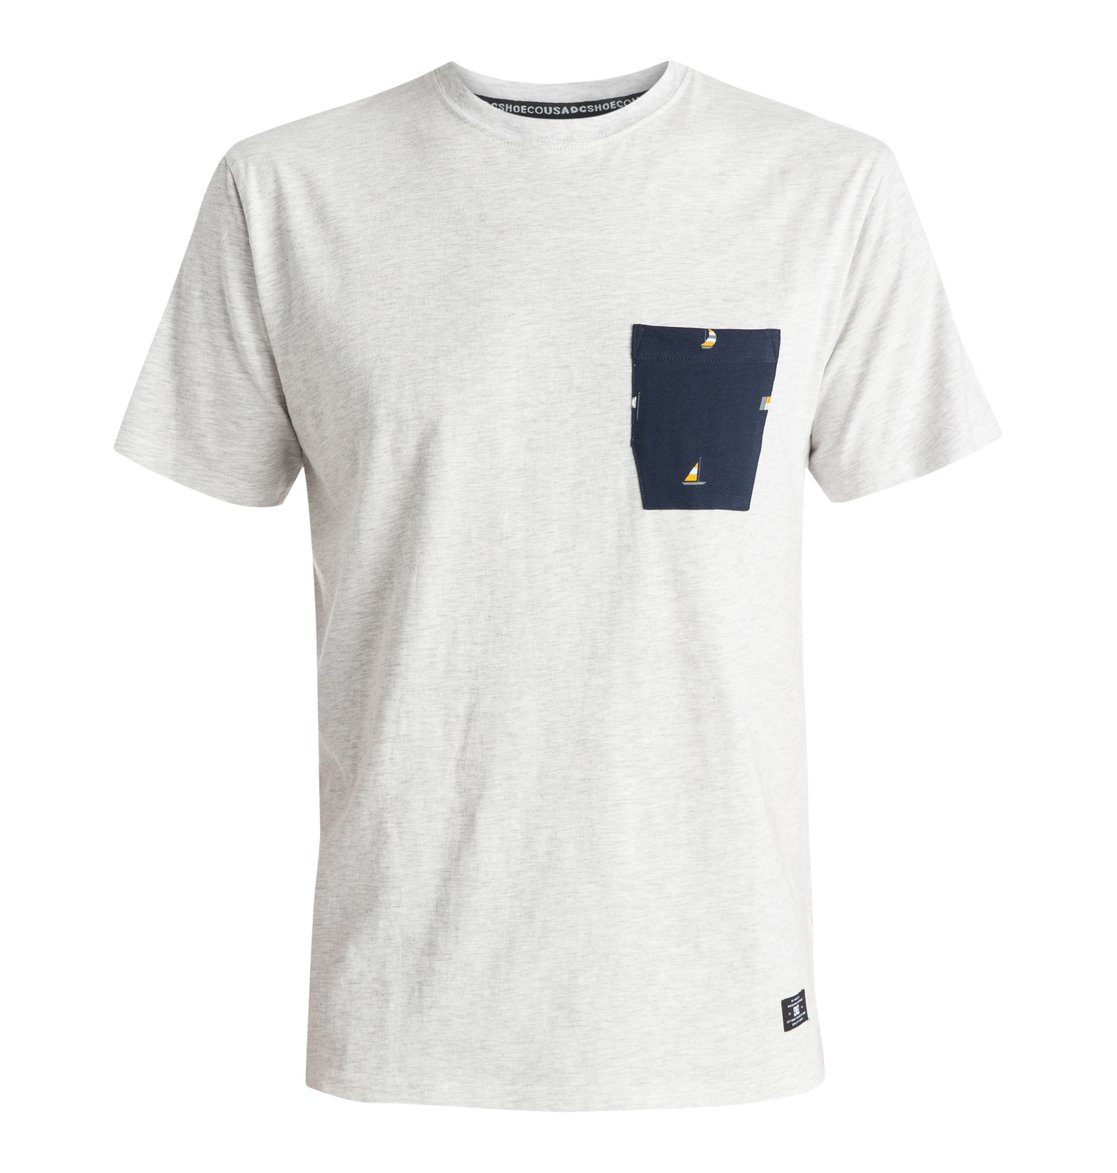 Woodglen T-Shirt. Производитель: Dcshoes, артикул: 3613371320874